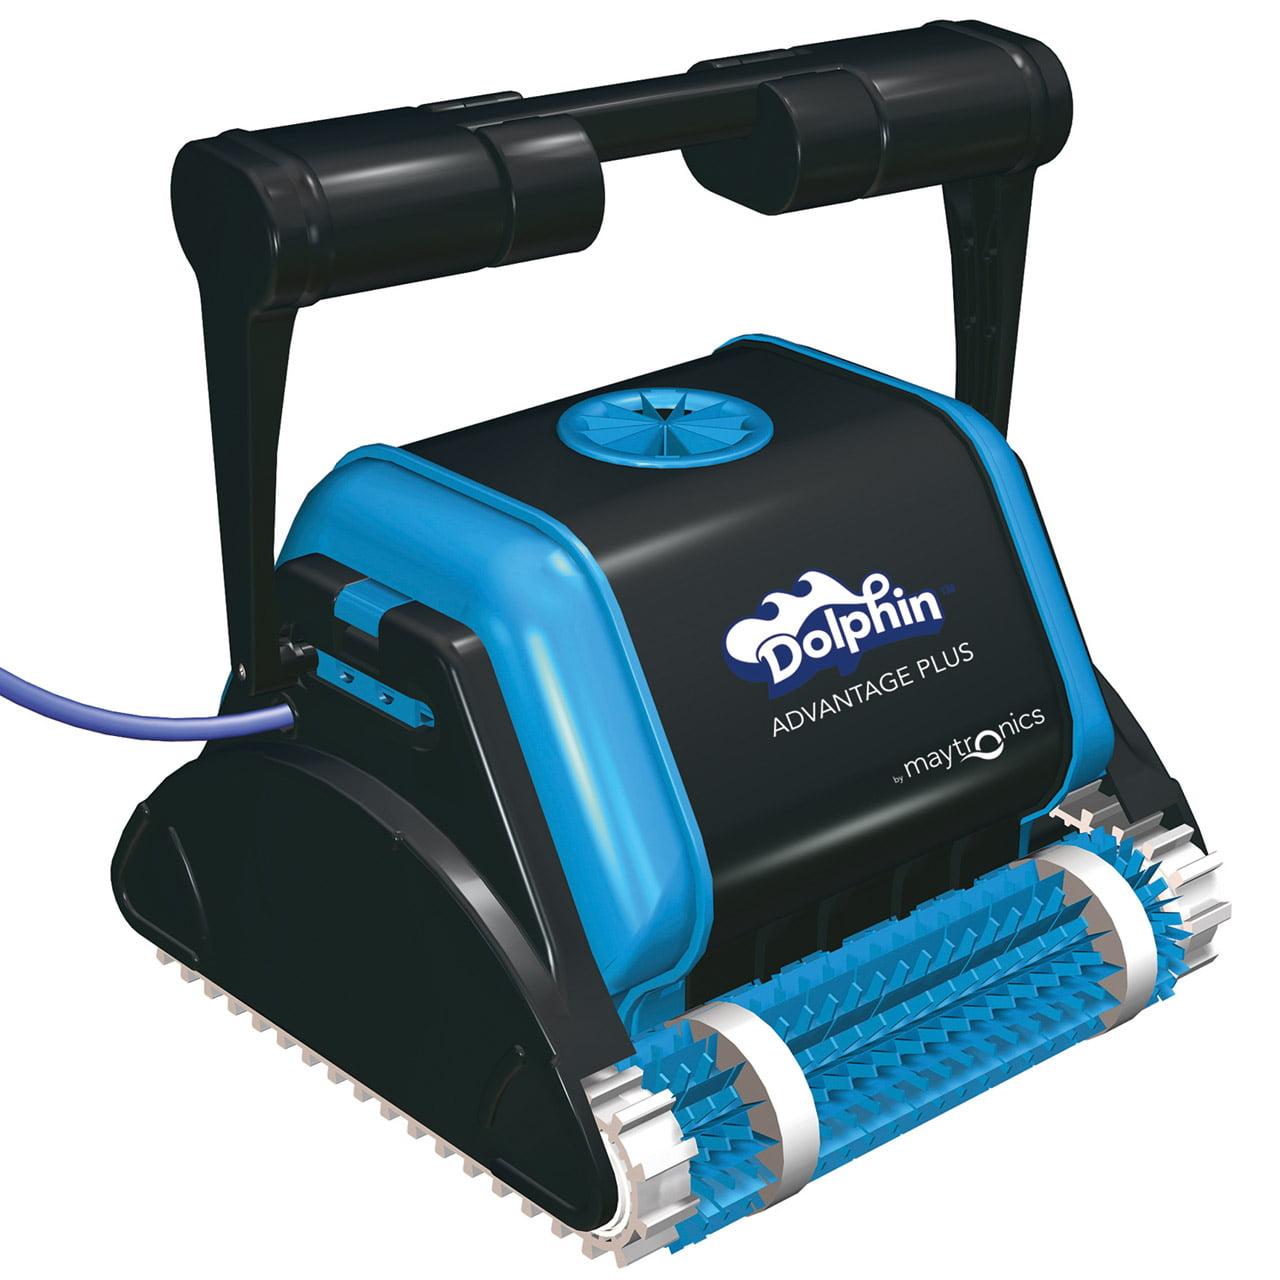 Dolphin Advantage Plus Electric Pool Cleaner Walmart Com